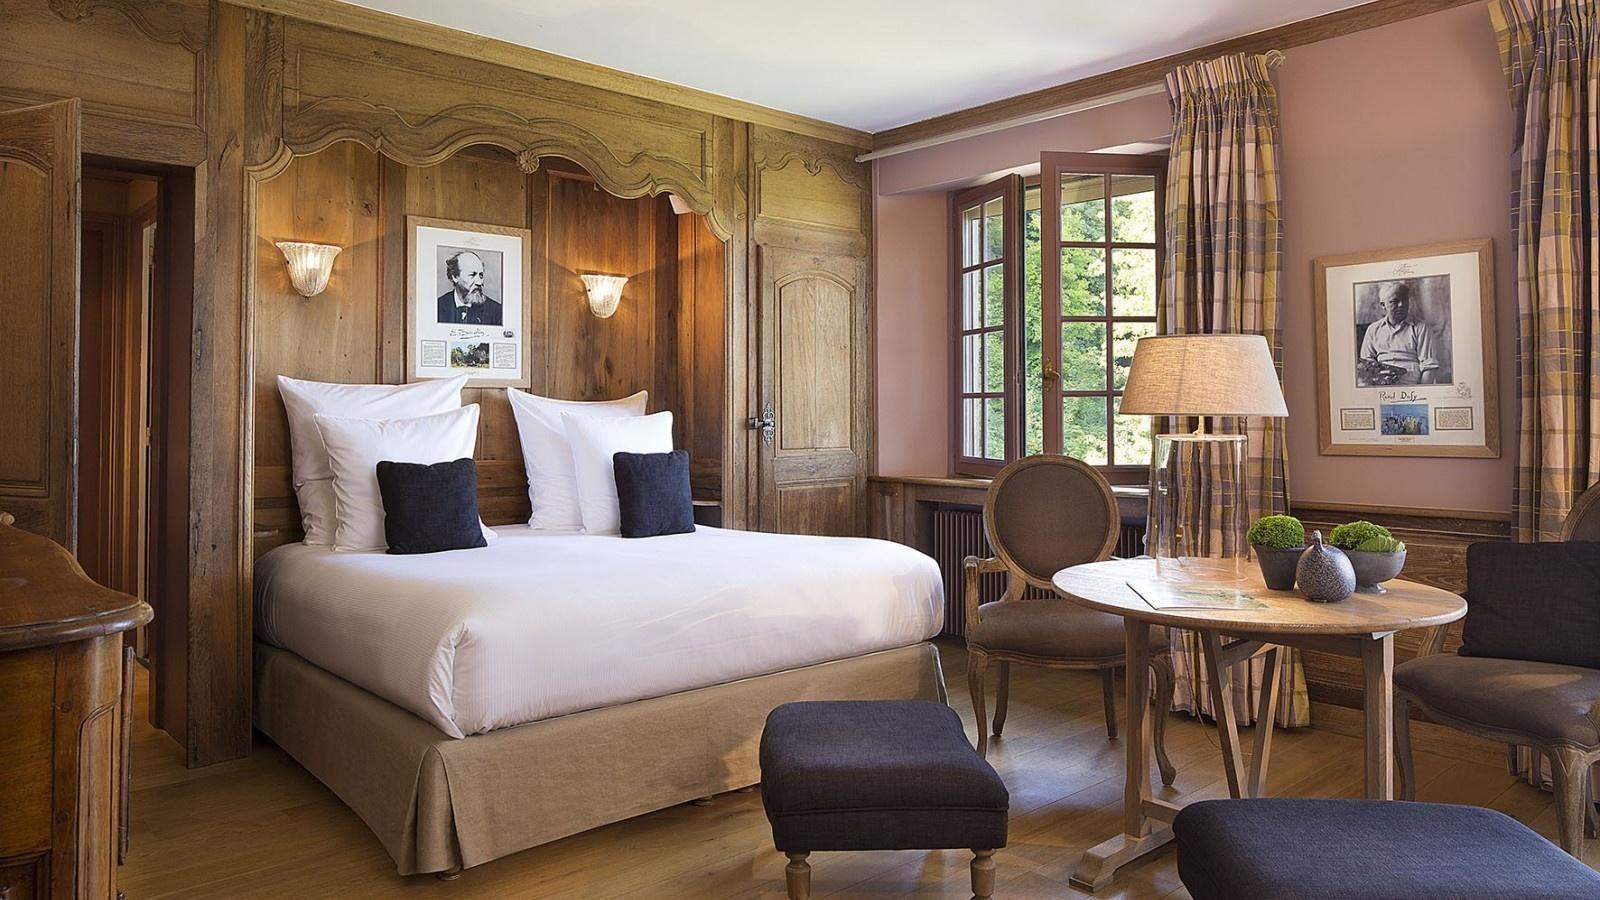 Hotel La Ferme Saint Simeon | Habitación Doble Deluxe